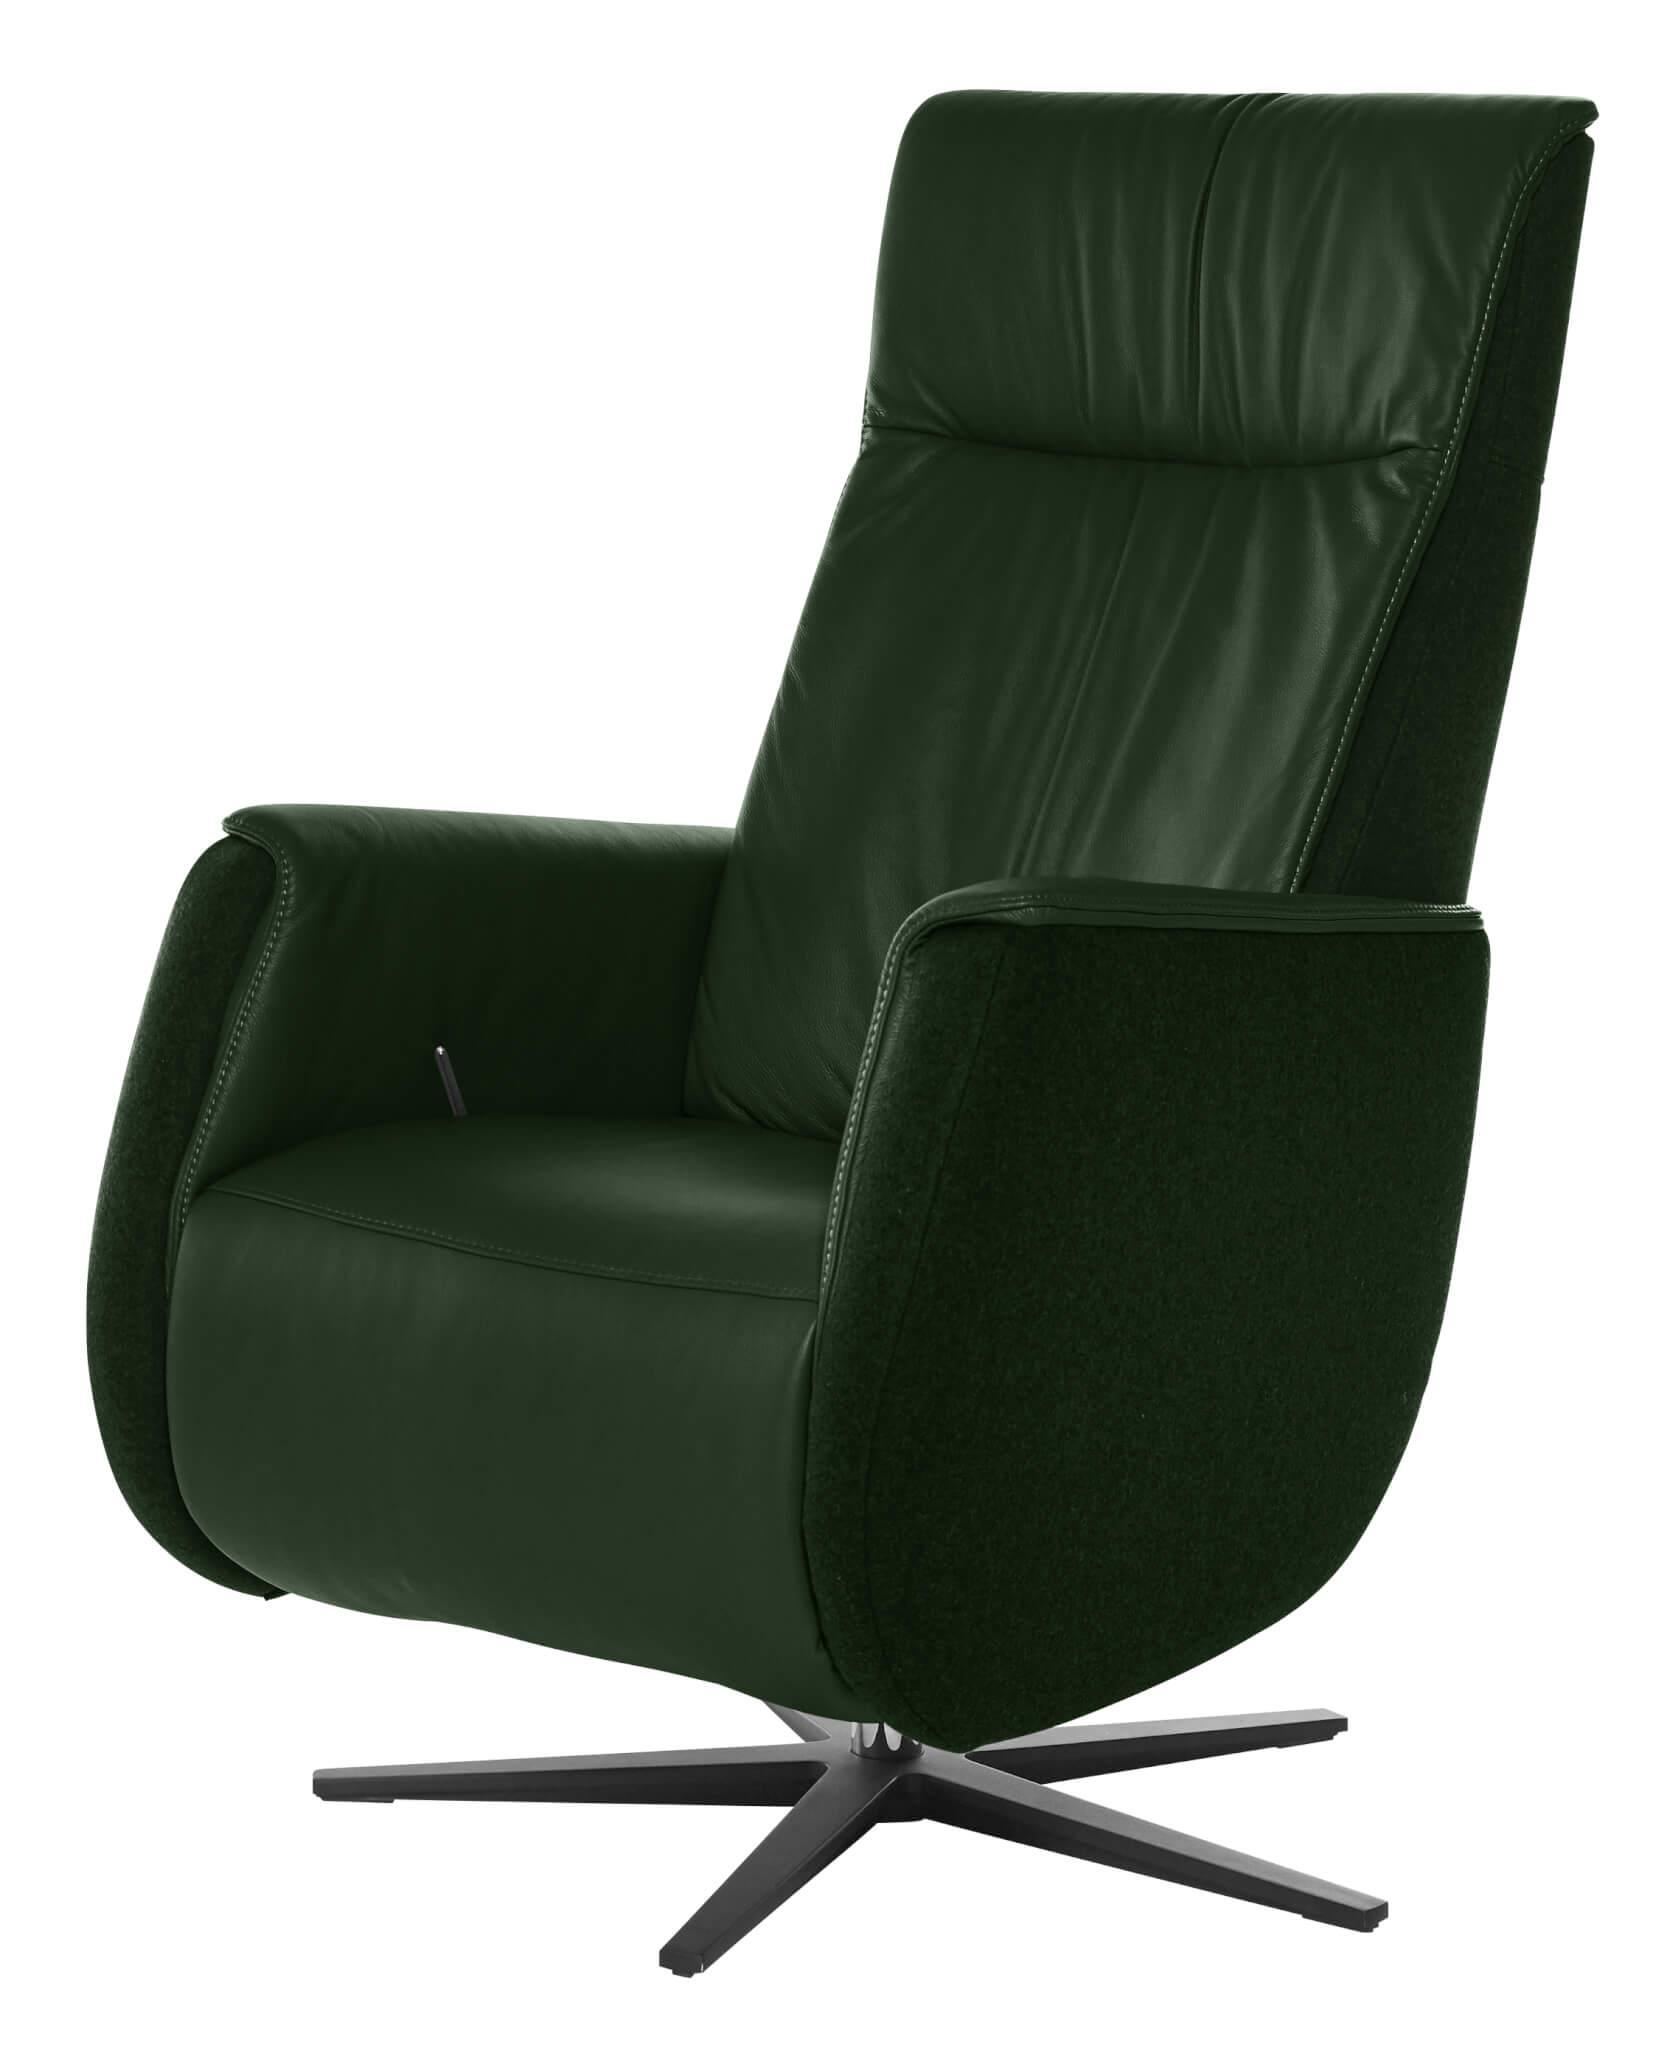 Relaxstoel Easysit R10